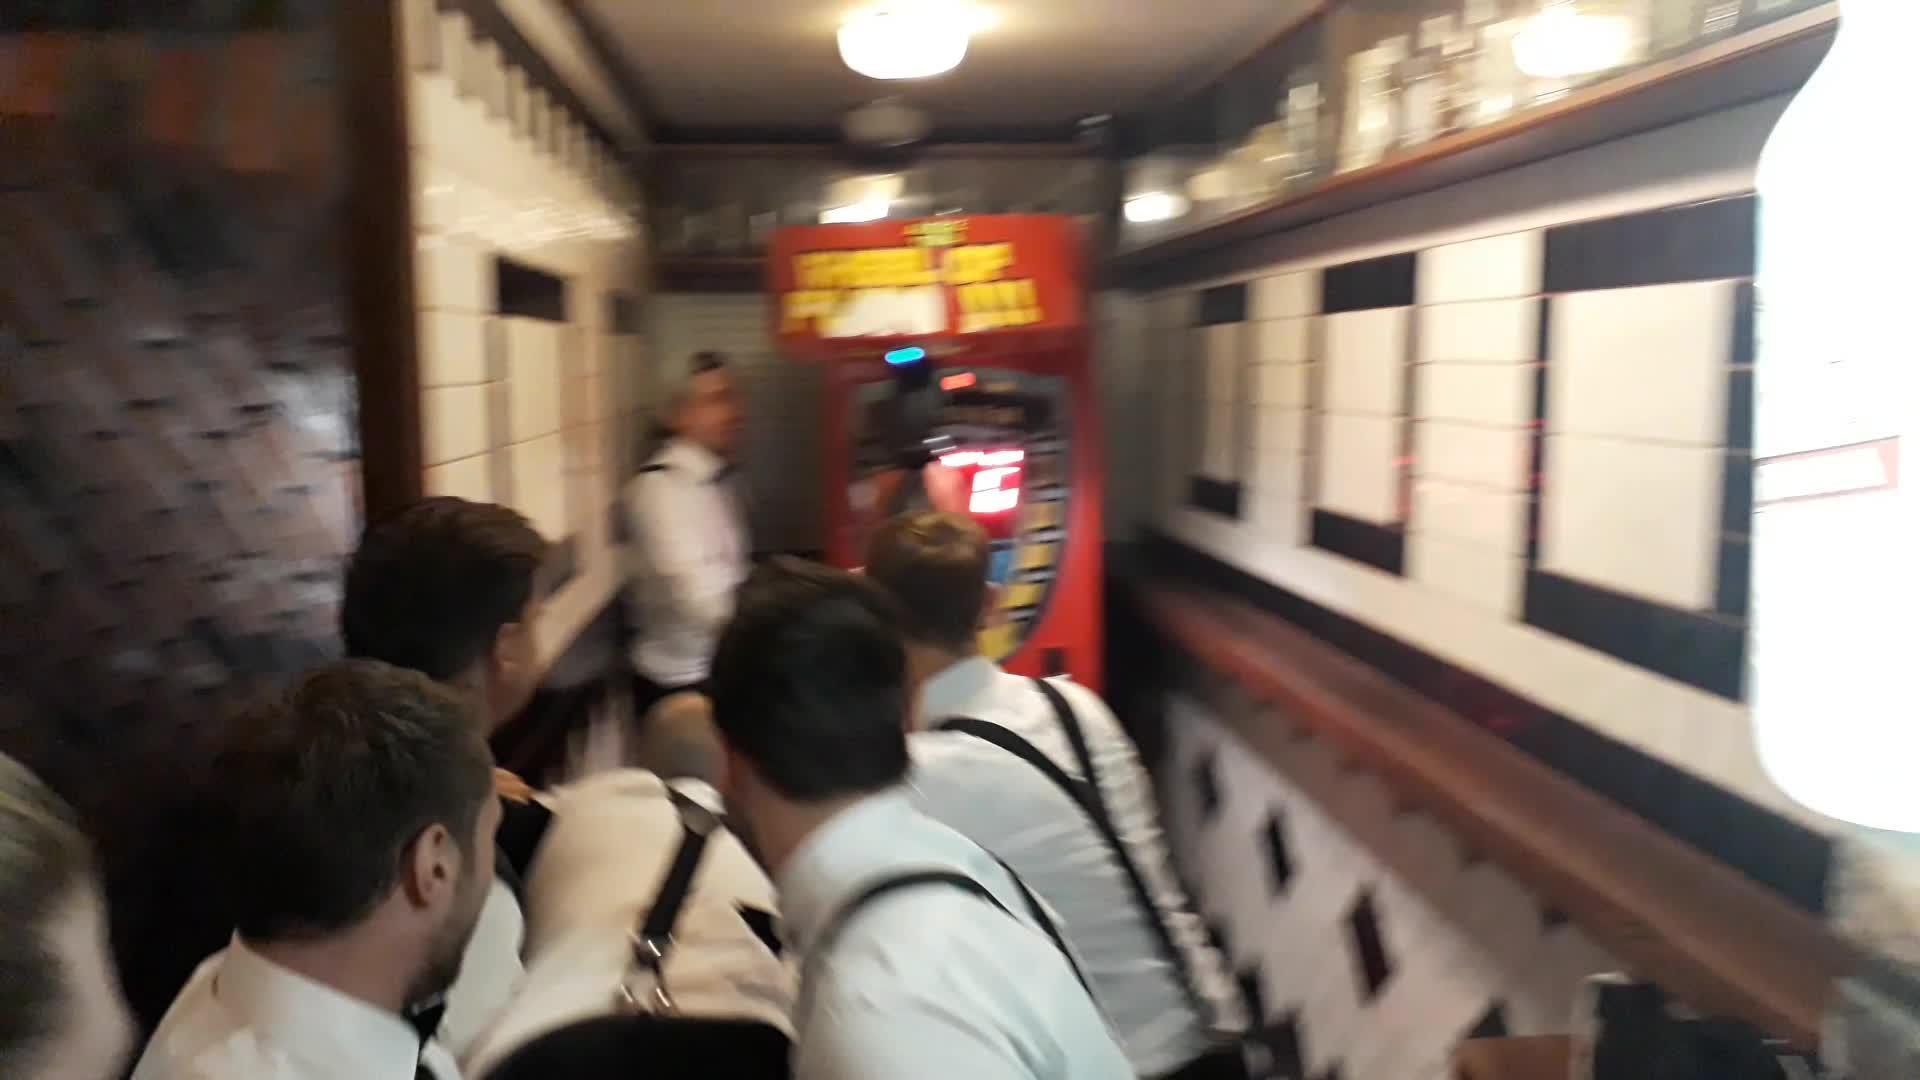 Guy Hits Punching Bag Arcade Game with Head | Jukin Media Inc